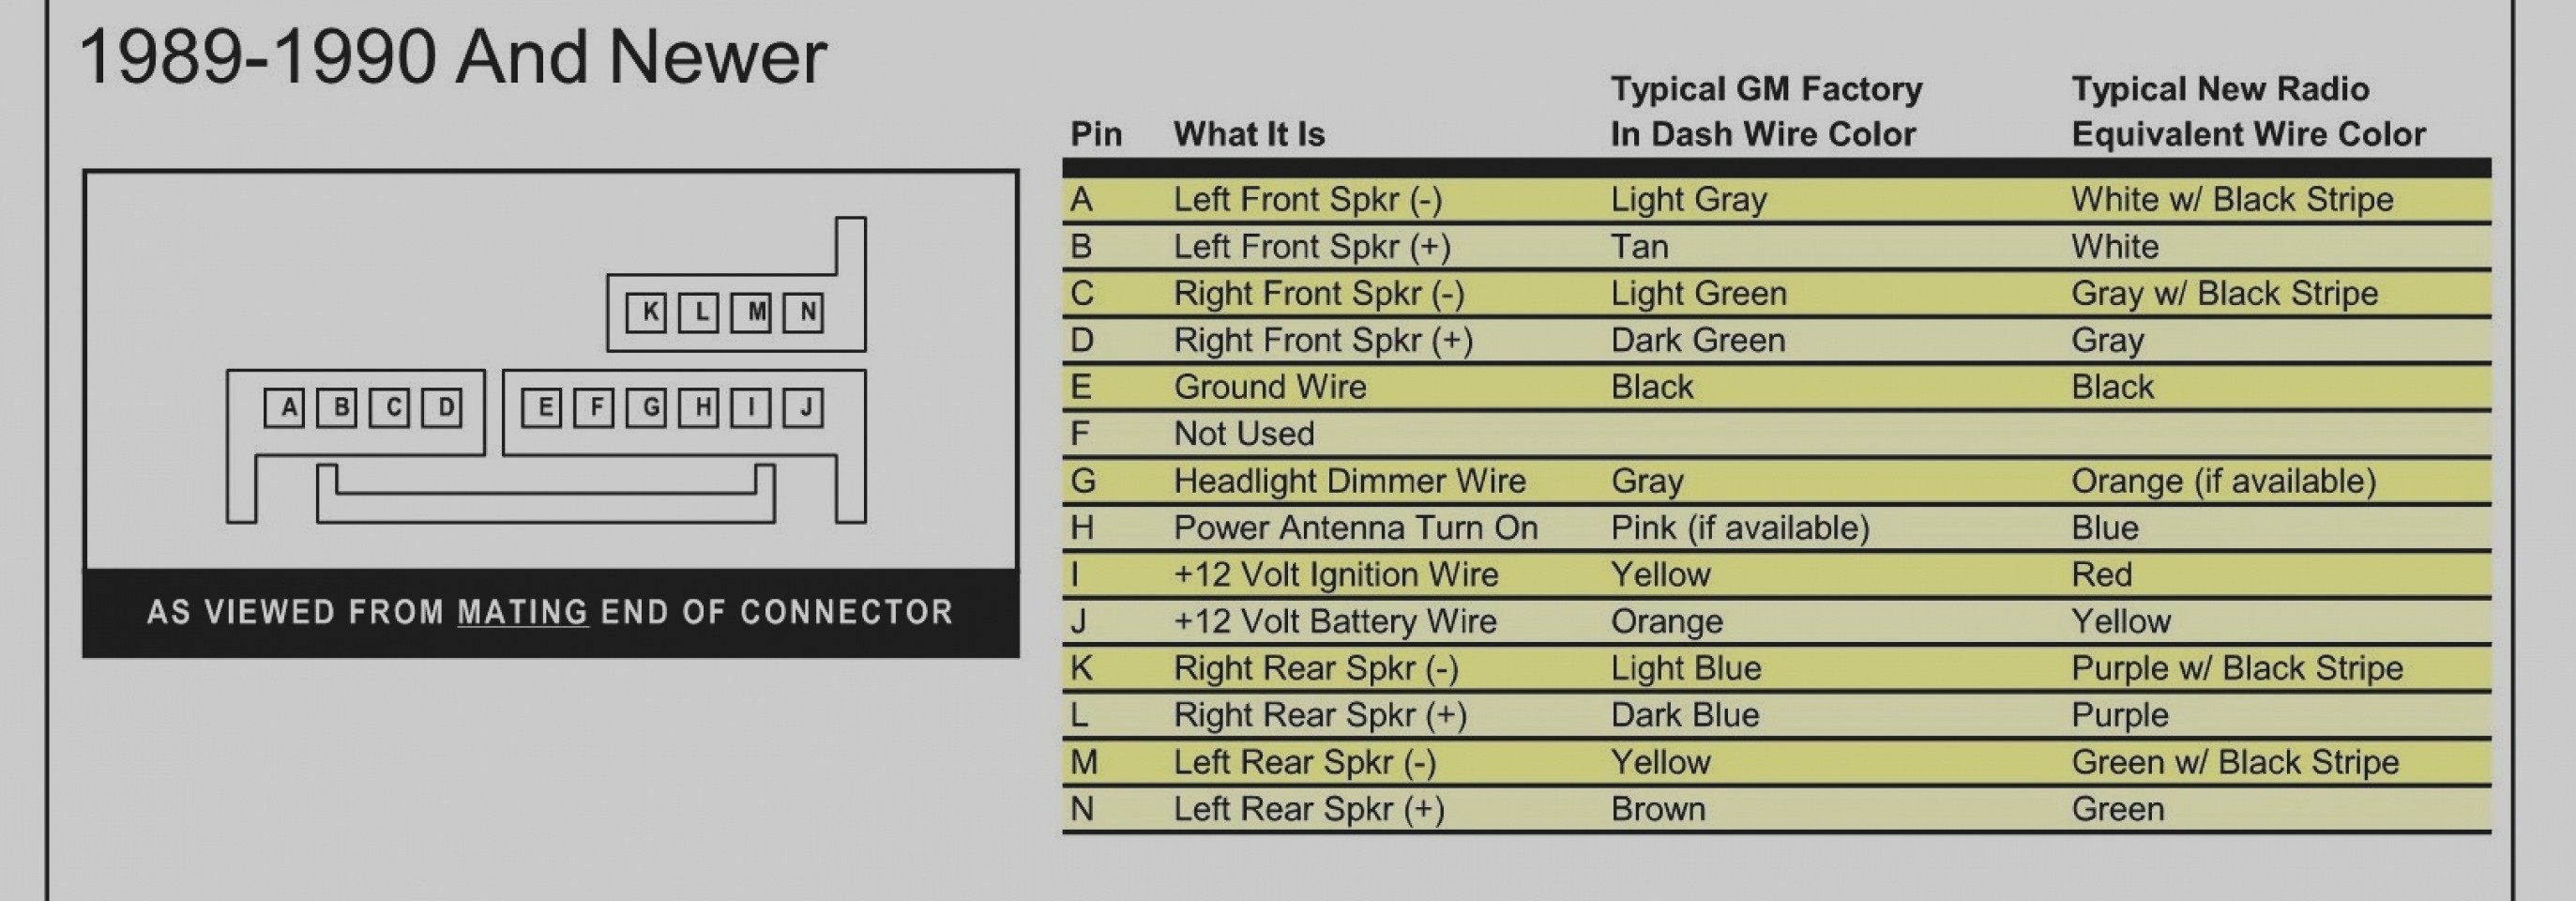 [DIAGRAM_38ZD]  2008 Trailblazer Stereo Wiring Diagram - E5 wiring diagram | 2007 Trailblazer Wiring Diagram |  | KUBB-AUF.DE